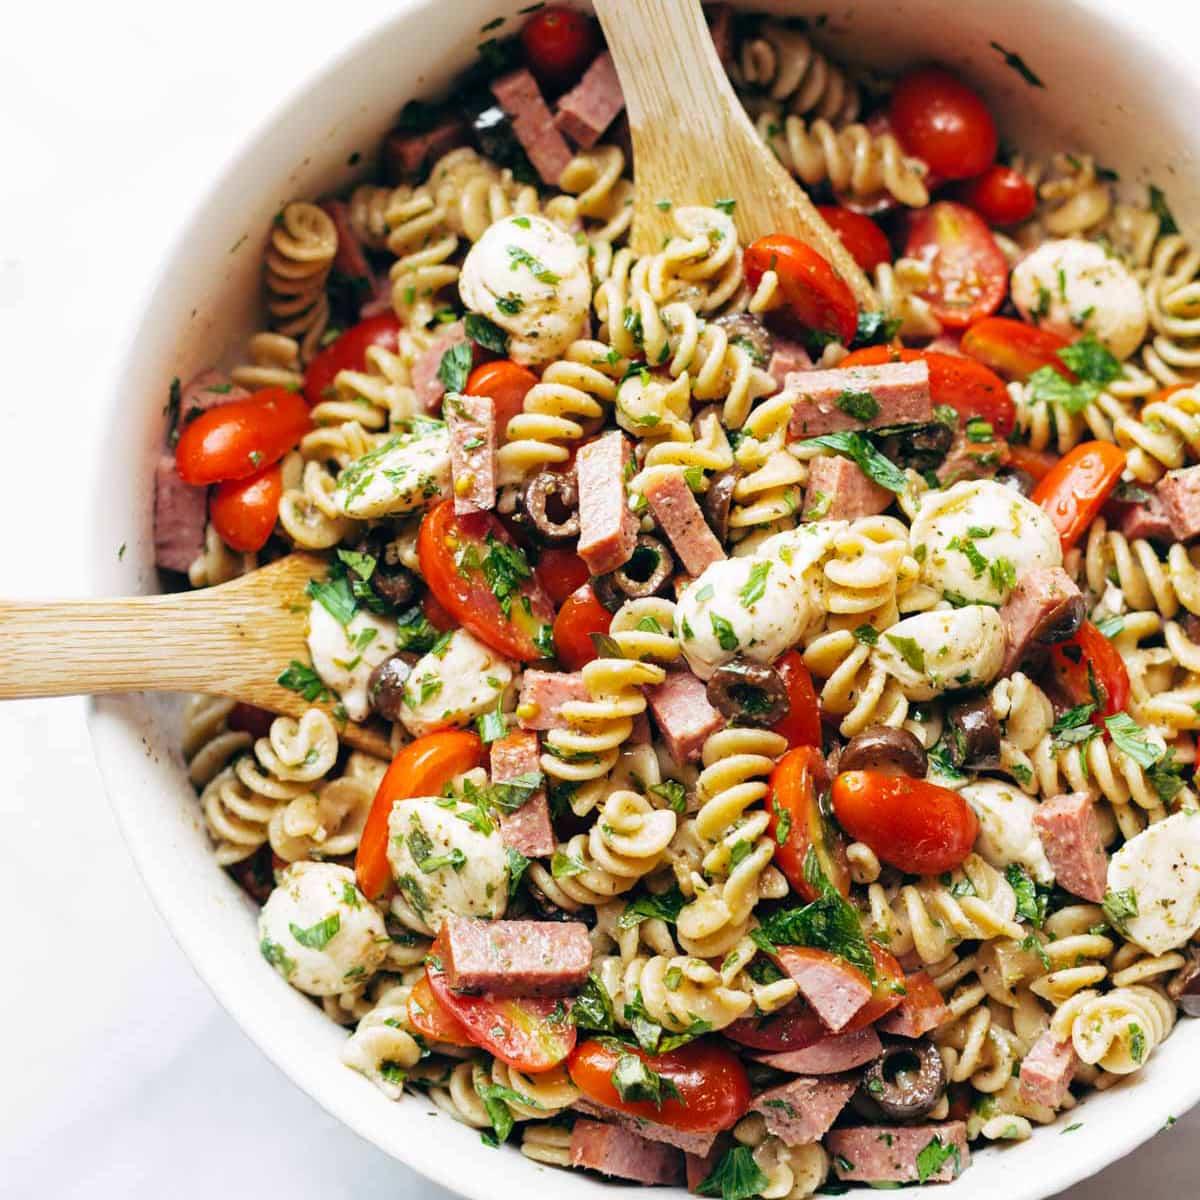 Salads Make the Best Summer Weight Loss Recipes - VCMBC